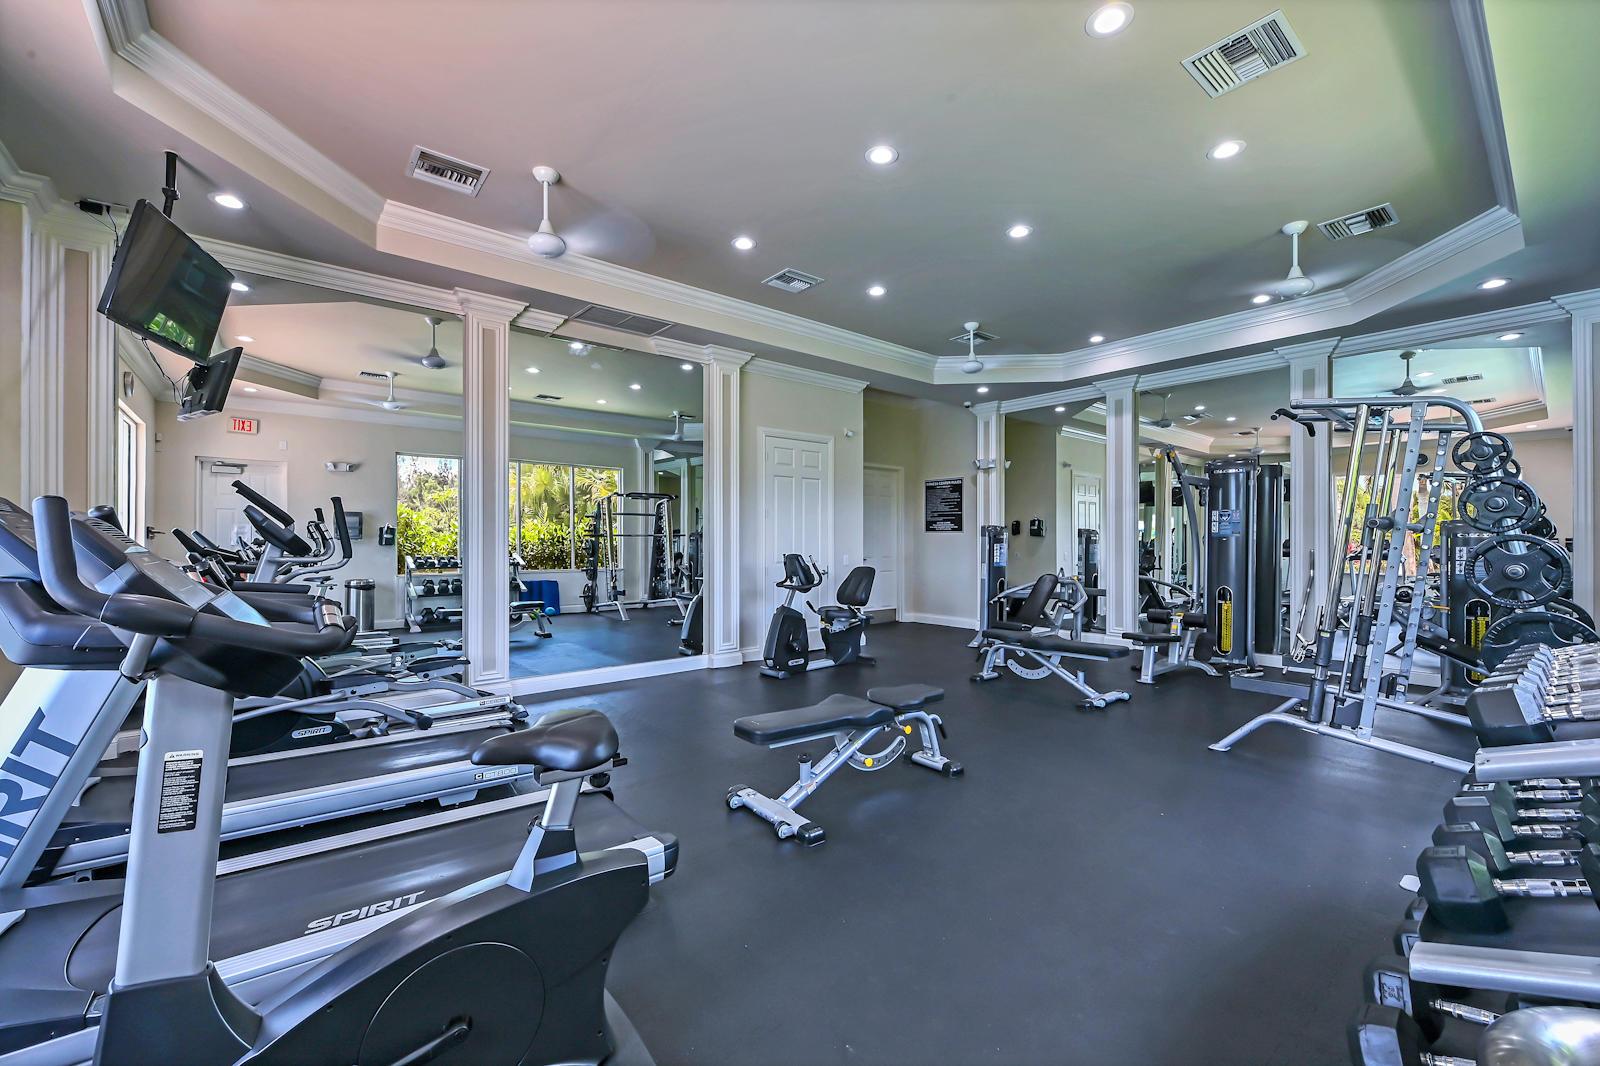 38 Gym Room 01